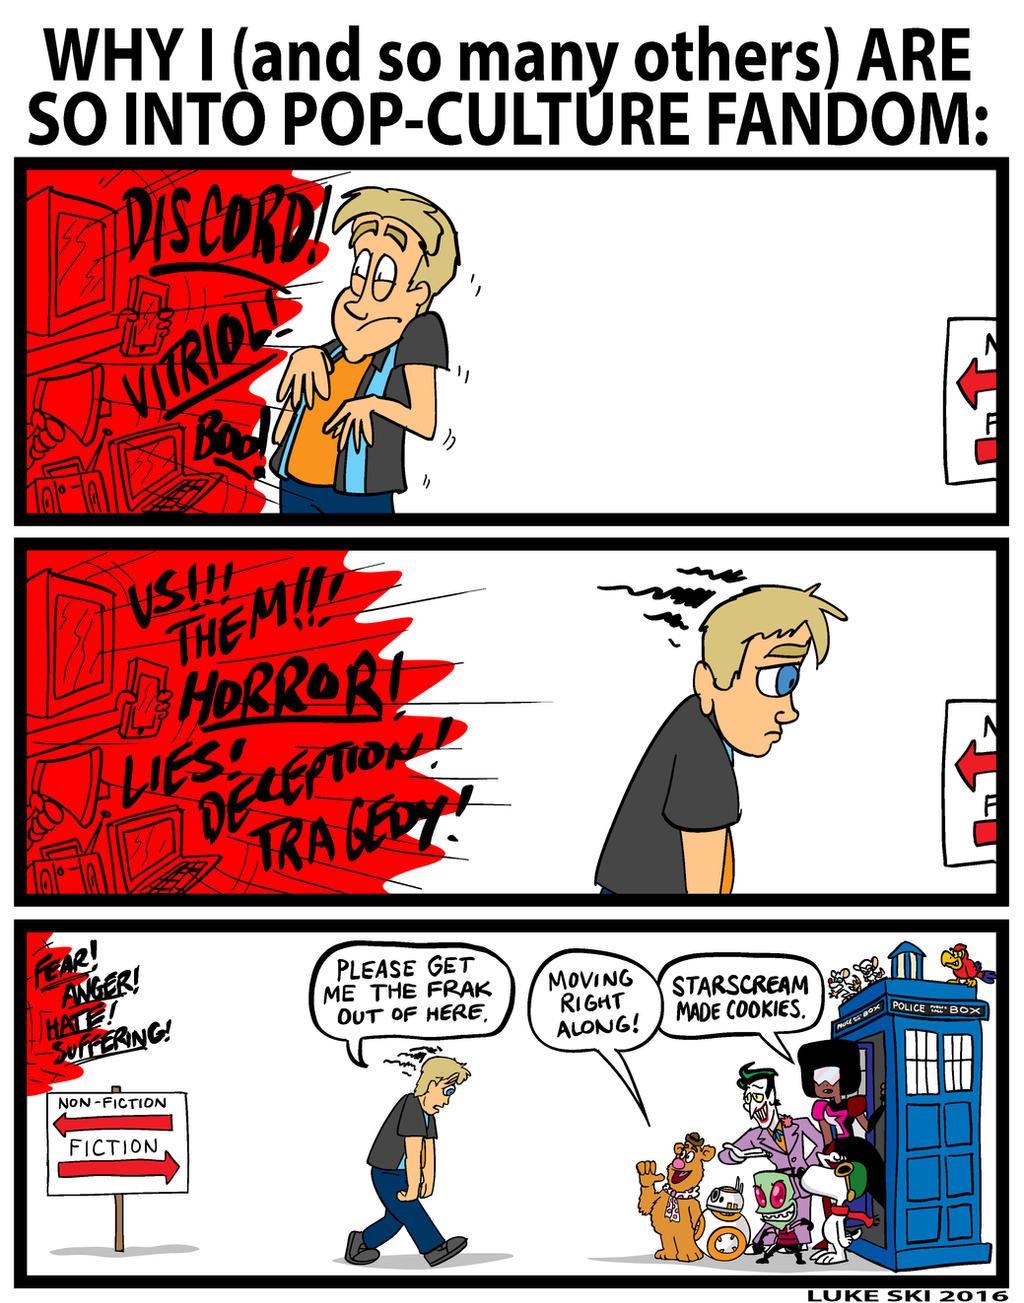 Pop Culture Fandom comic by Luke Ski by artbylukeski